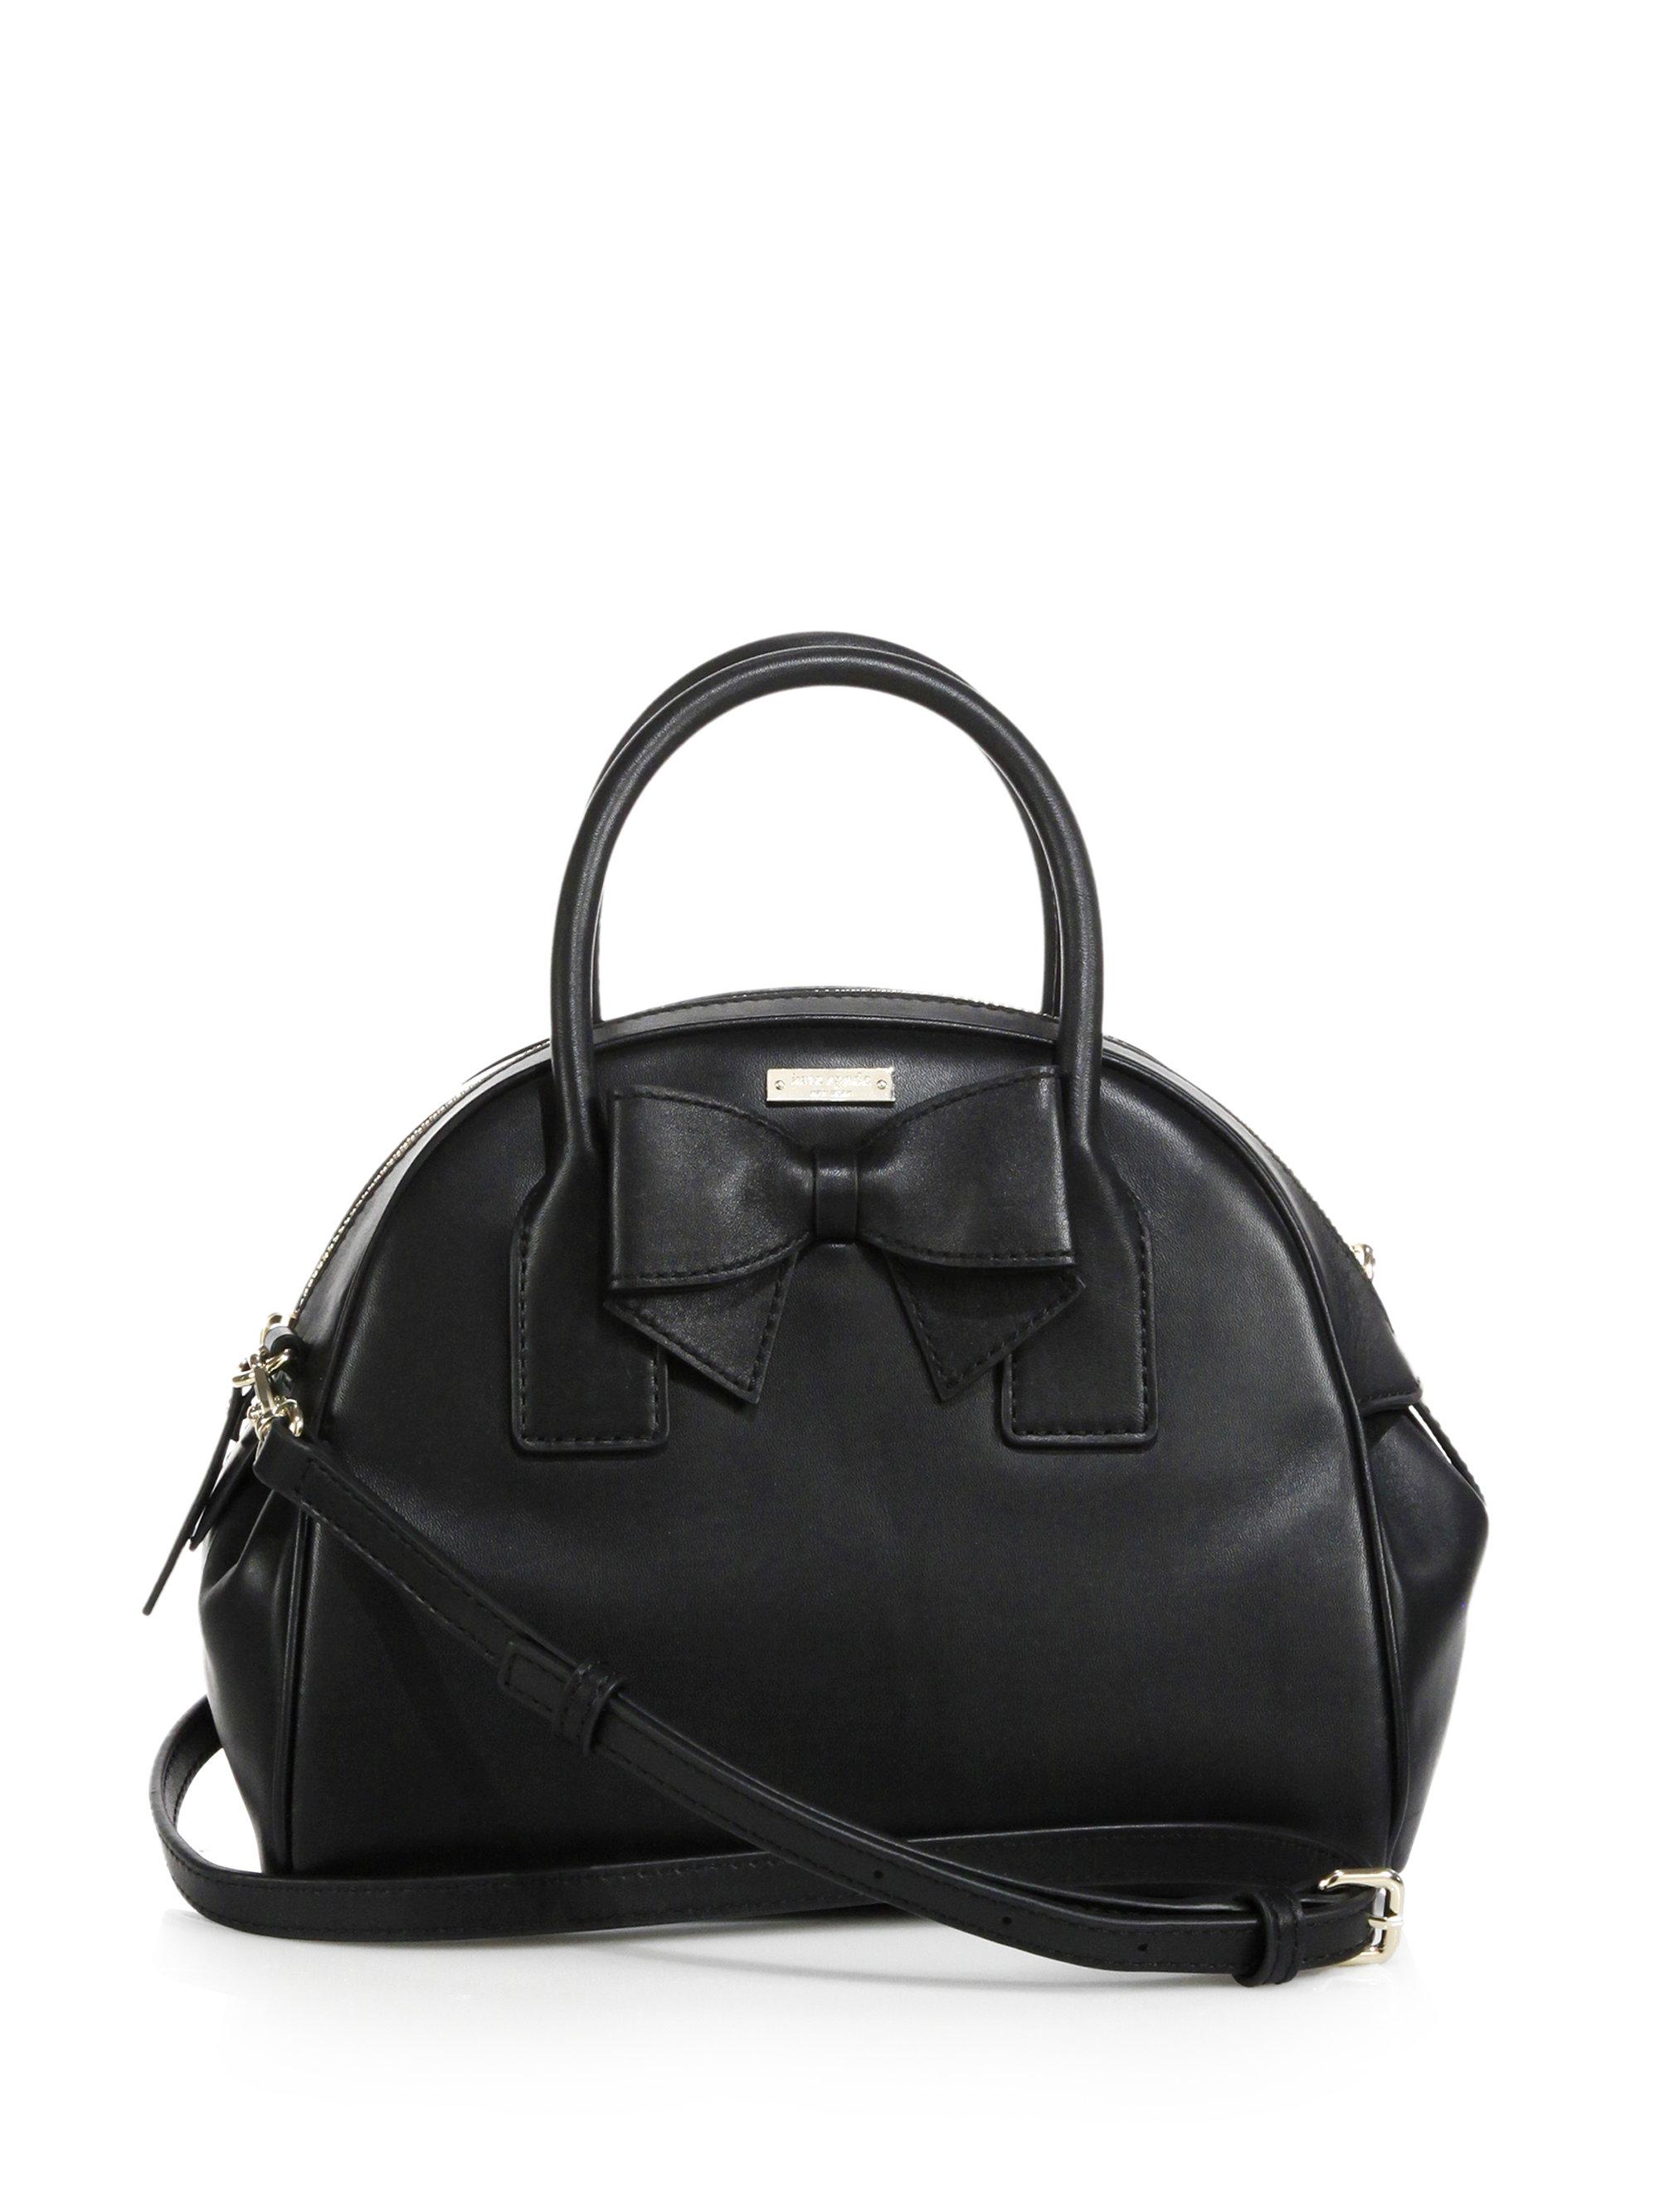 0290a61cb8 Lyst - Kate Spade Hanover Street Small Lorin Bowler Bag in Black